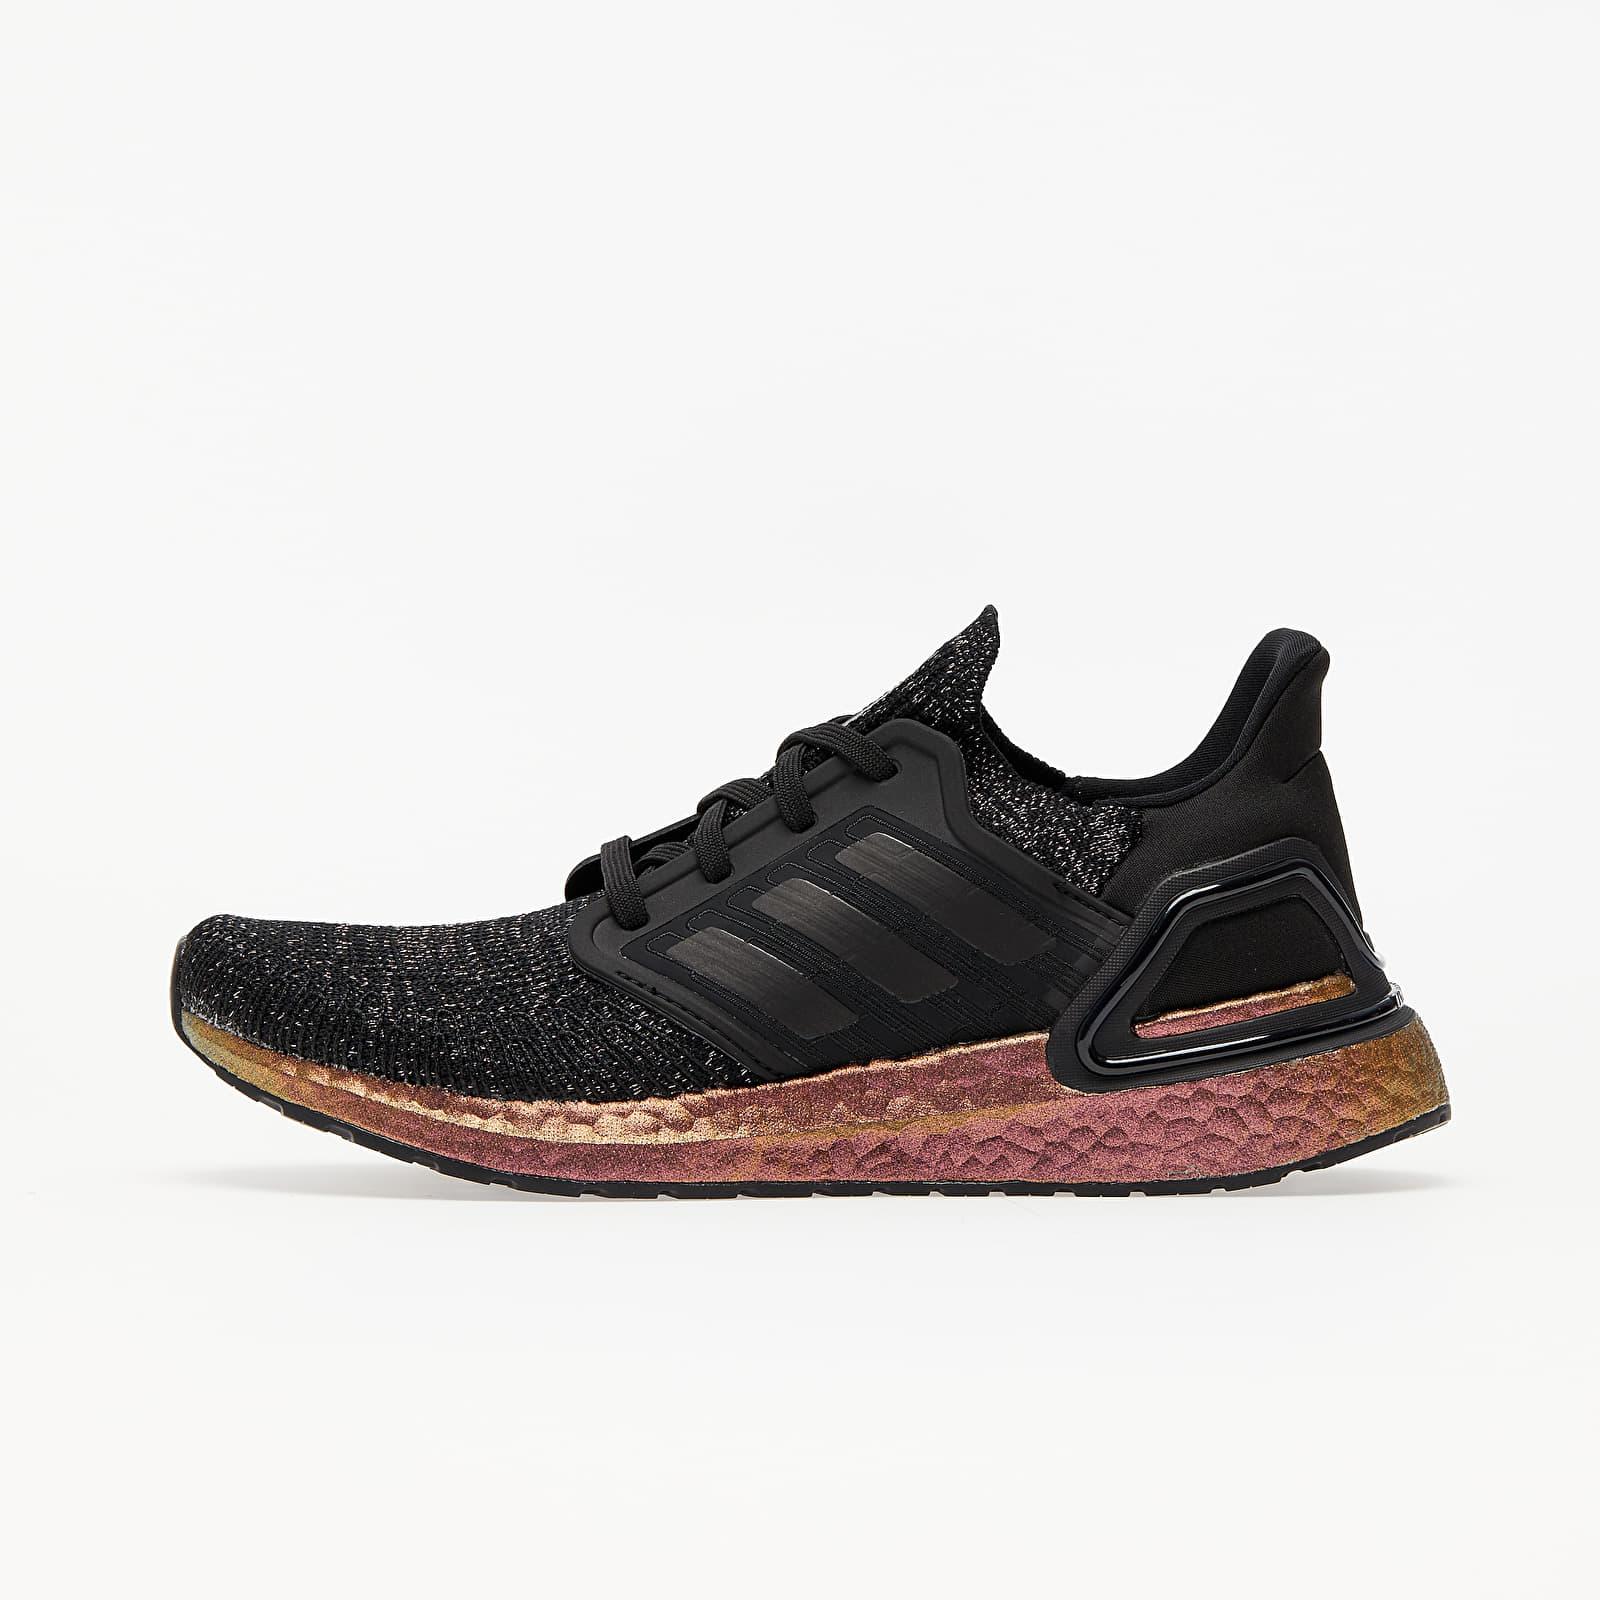 Dámske topánky a tenisky adidas UltraBOOST 20 W Core Black/ Core Black/ Signature Pink